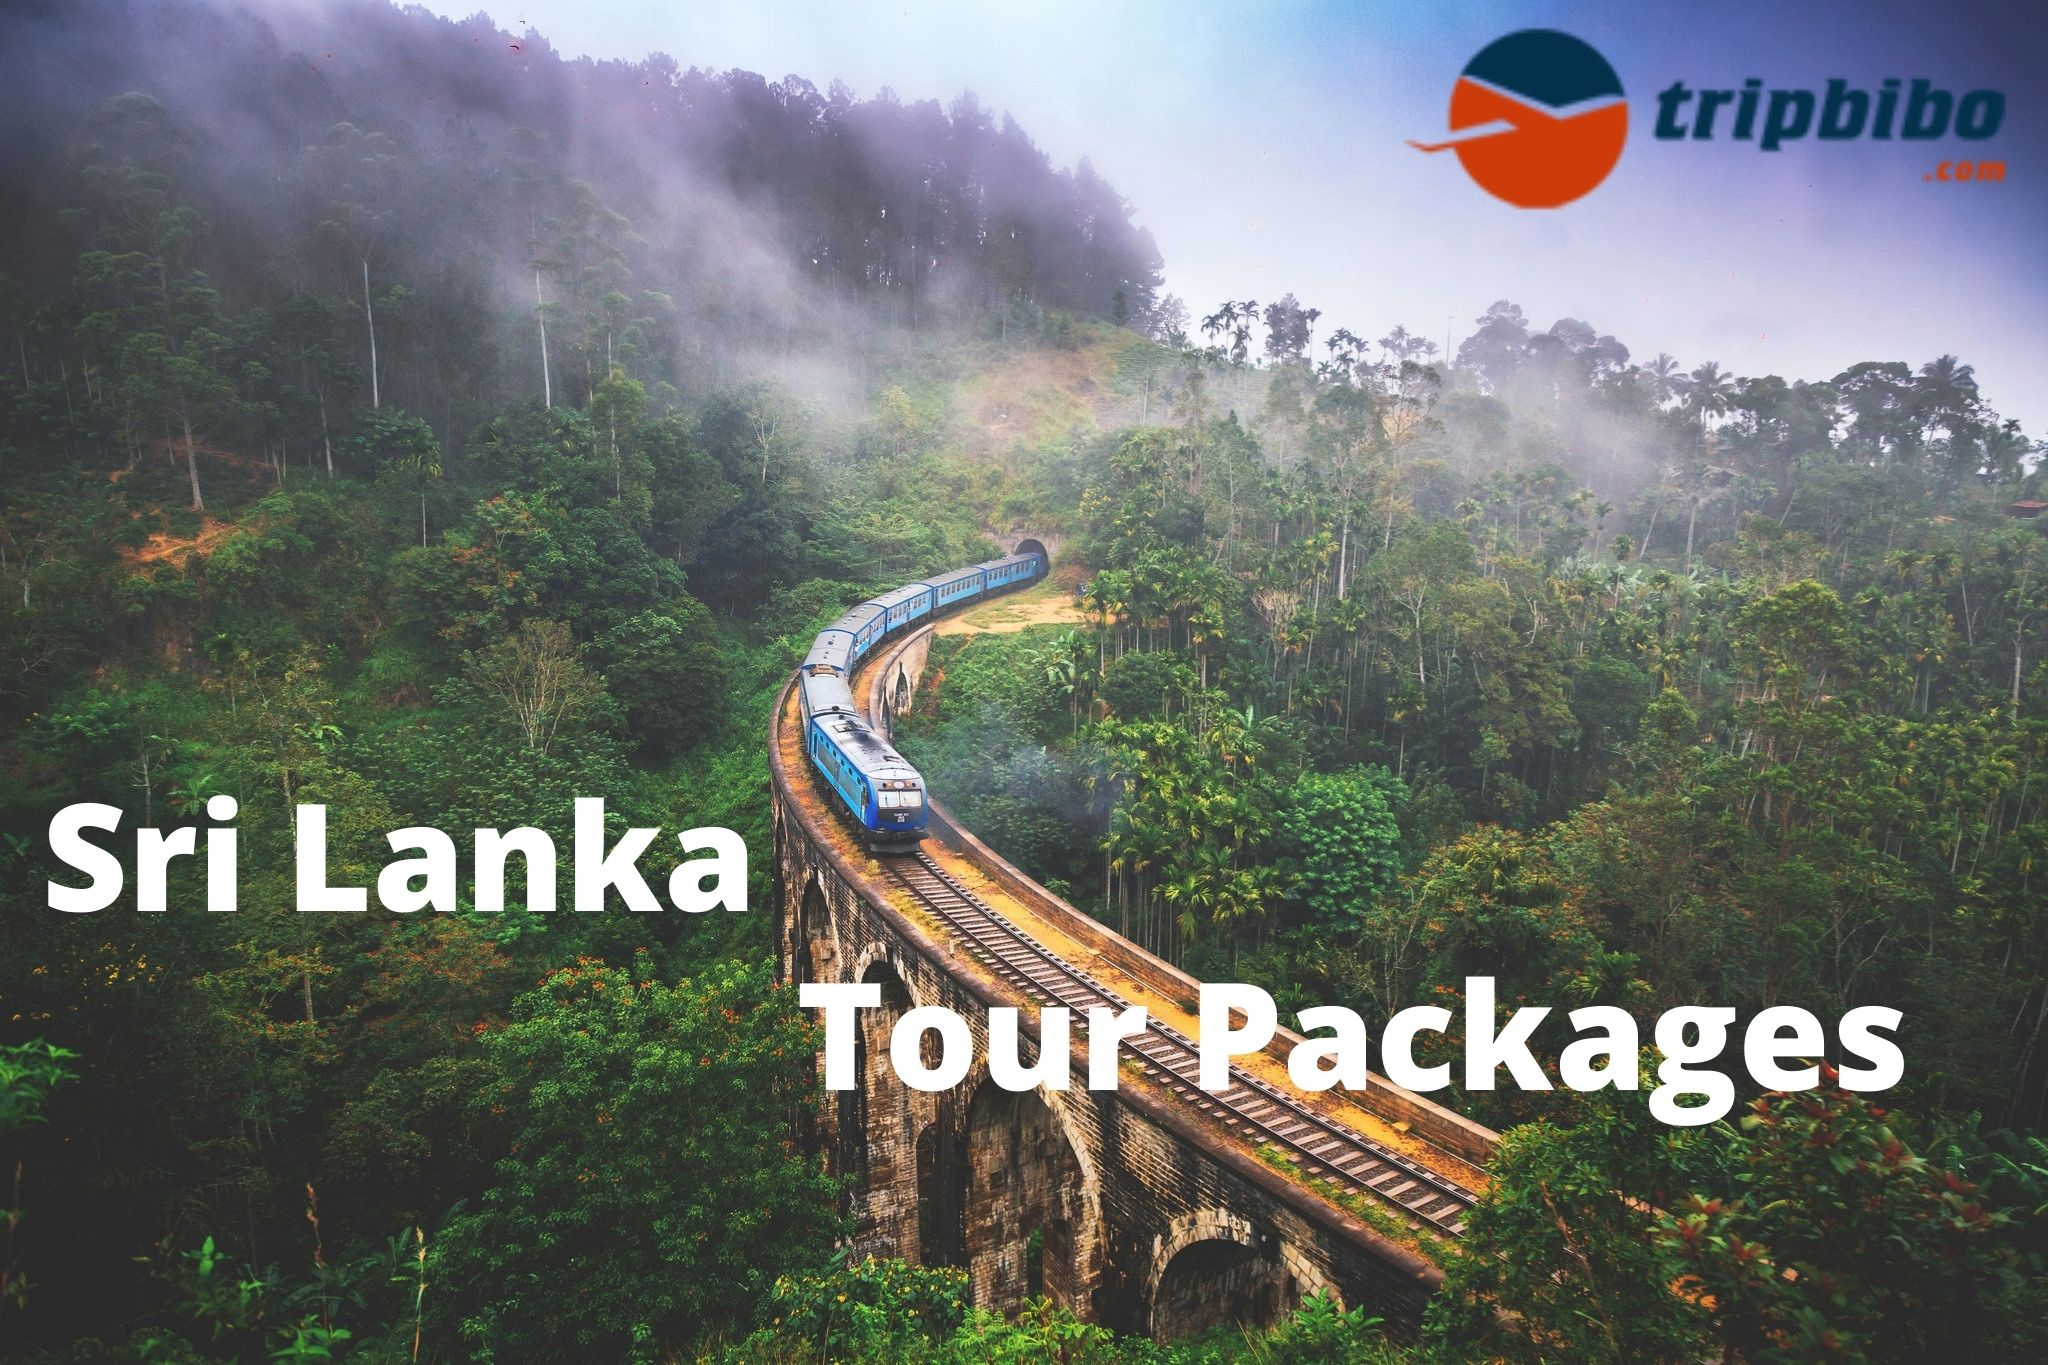 Book Top 50 Sri Lanka Tour Packages - Tripbibo